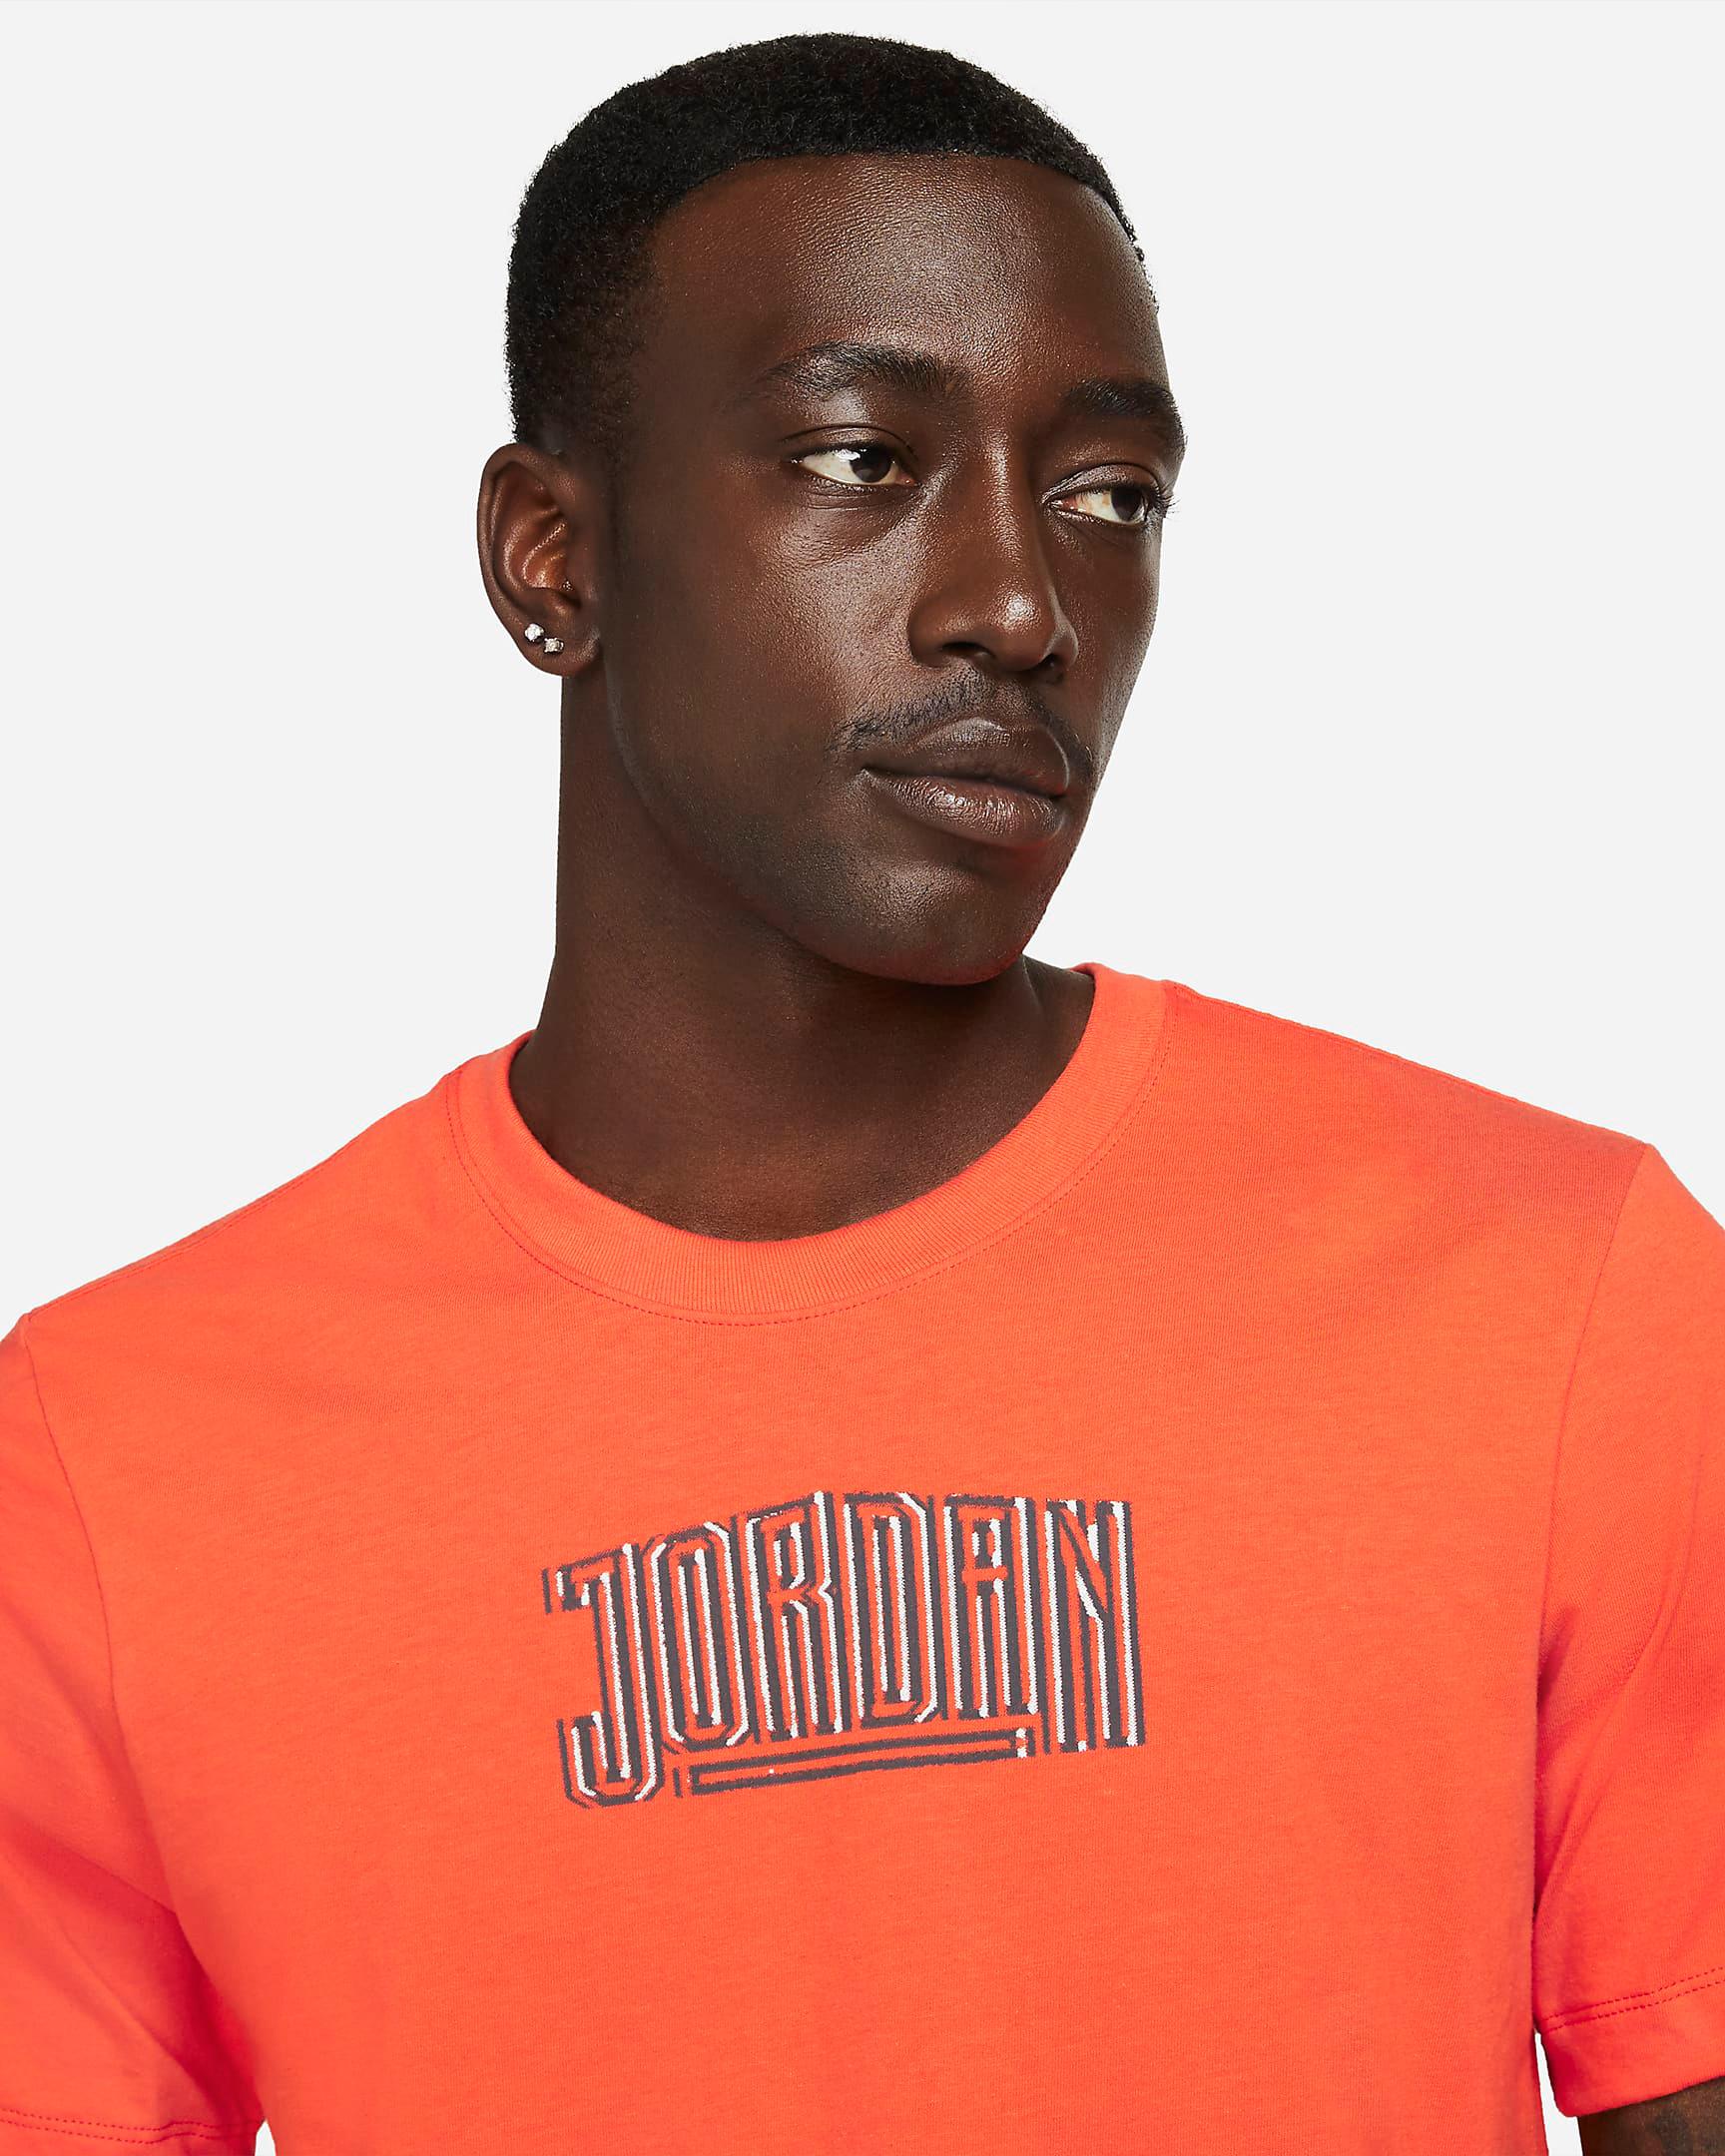 jordan-1-high-og-electro-orange-t-shirt-1